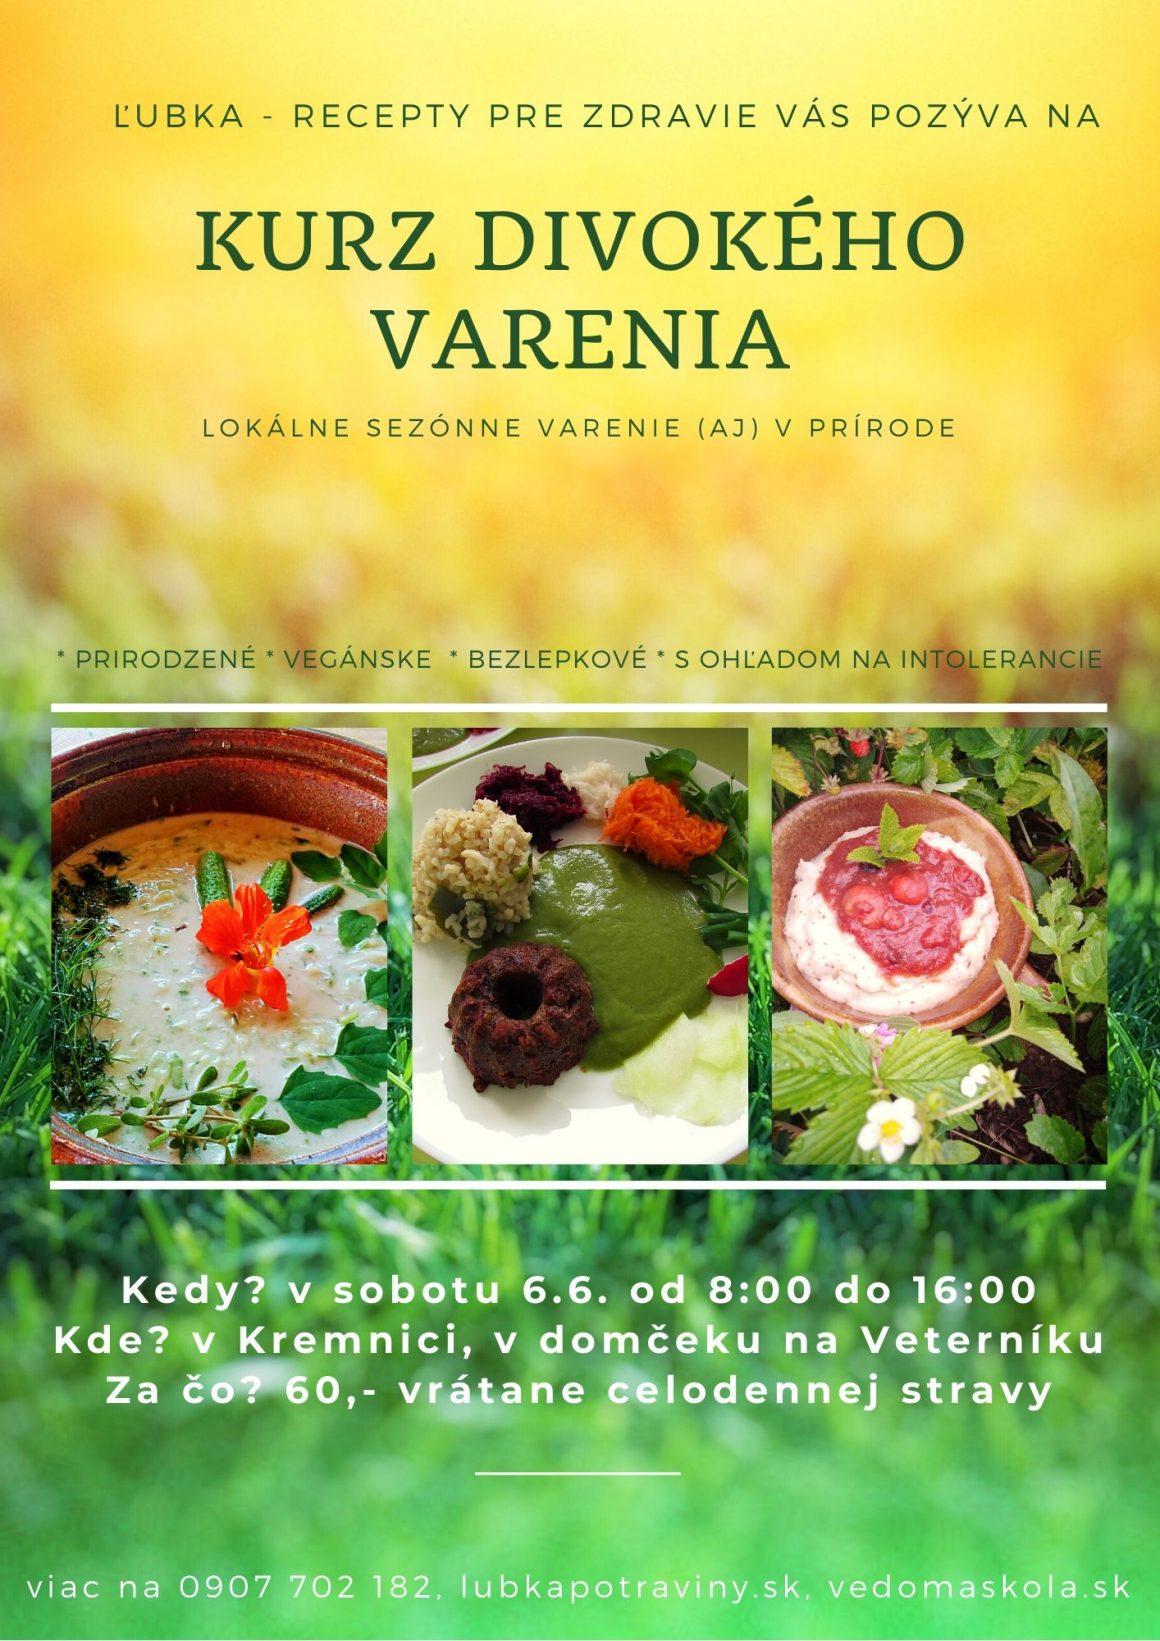 Kurz divokého varenia v Kremnici